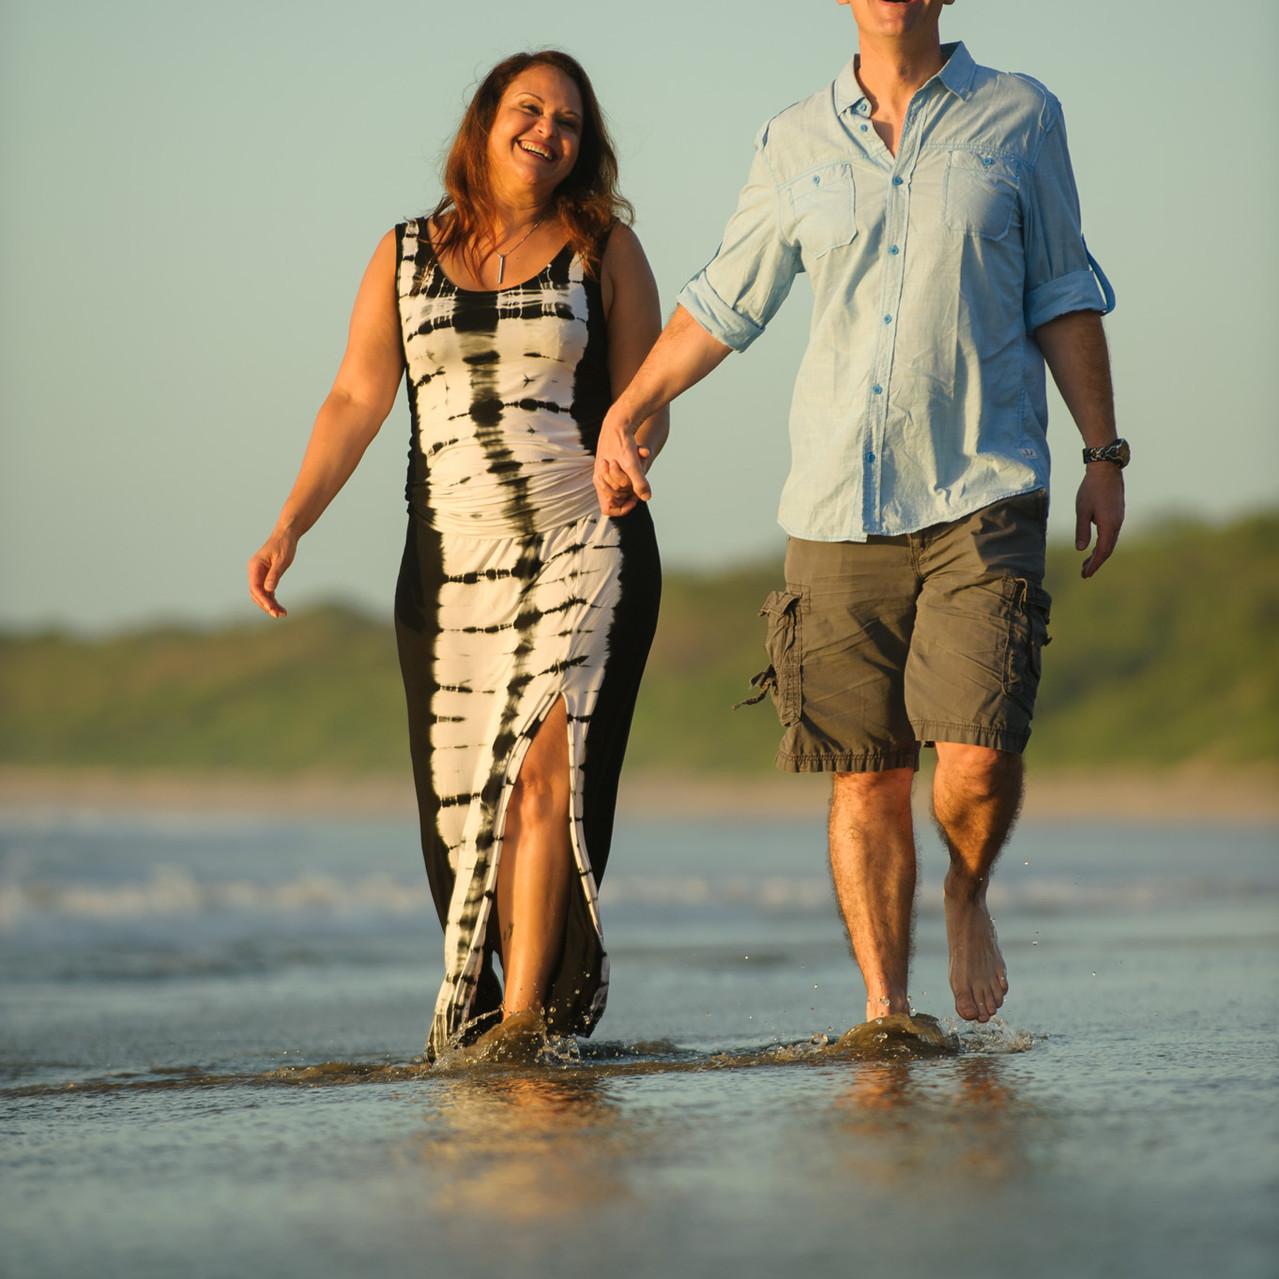 Husband and wife walk on the beach in Hacienda Pinilla